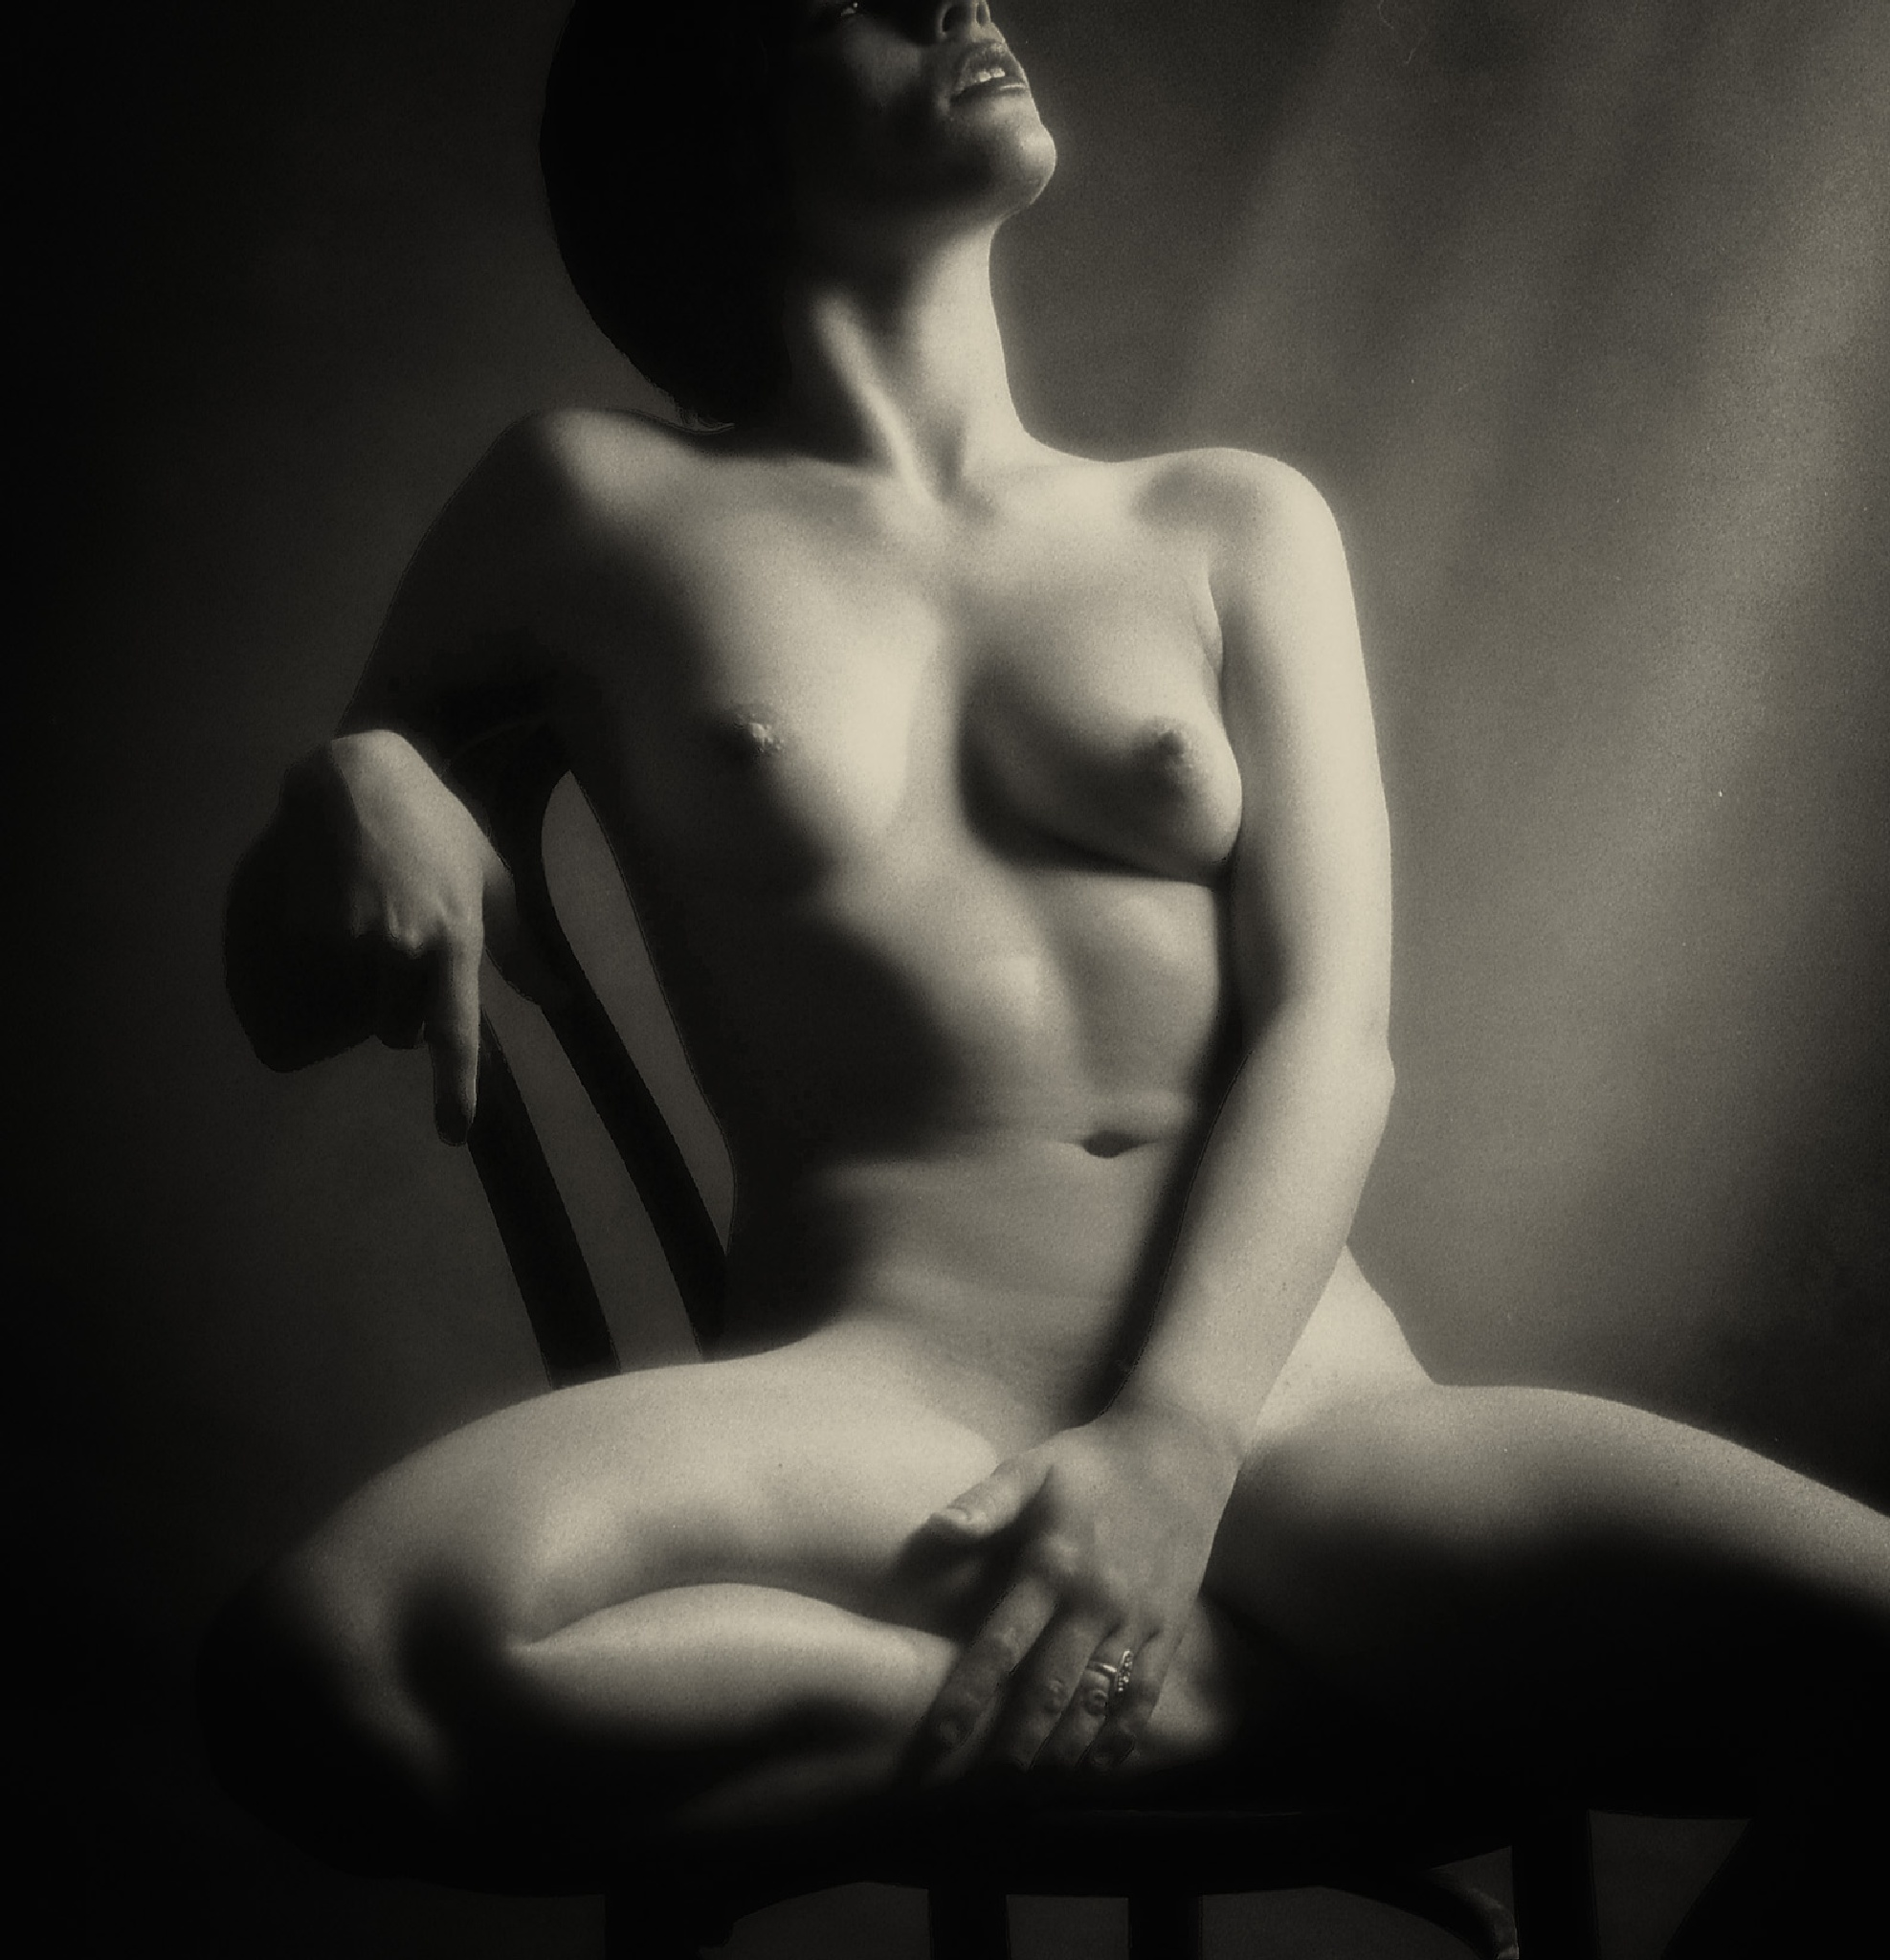 Swedish nude by Pixforce